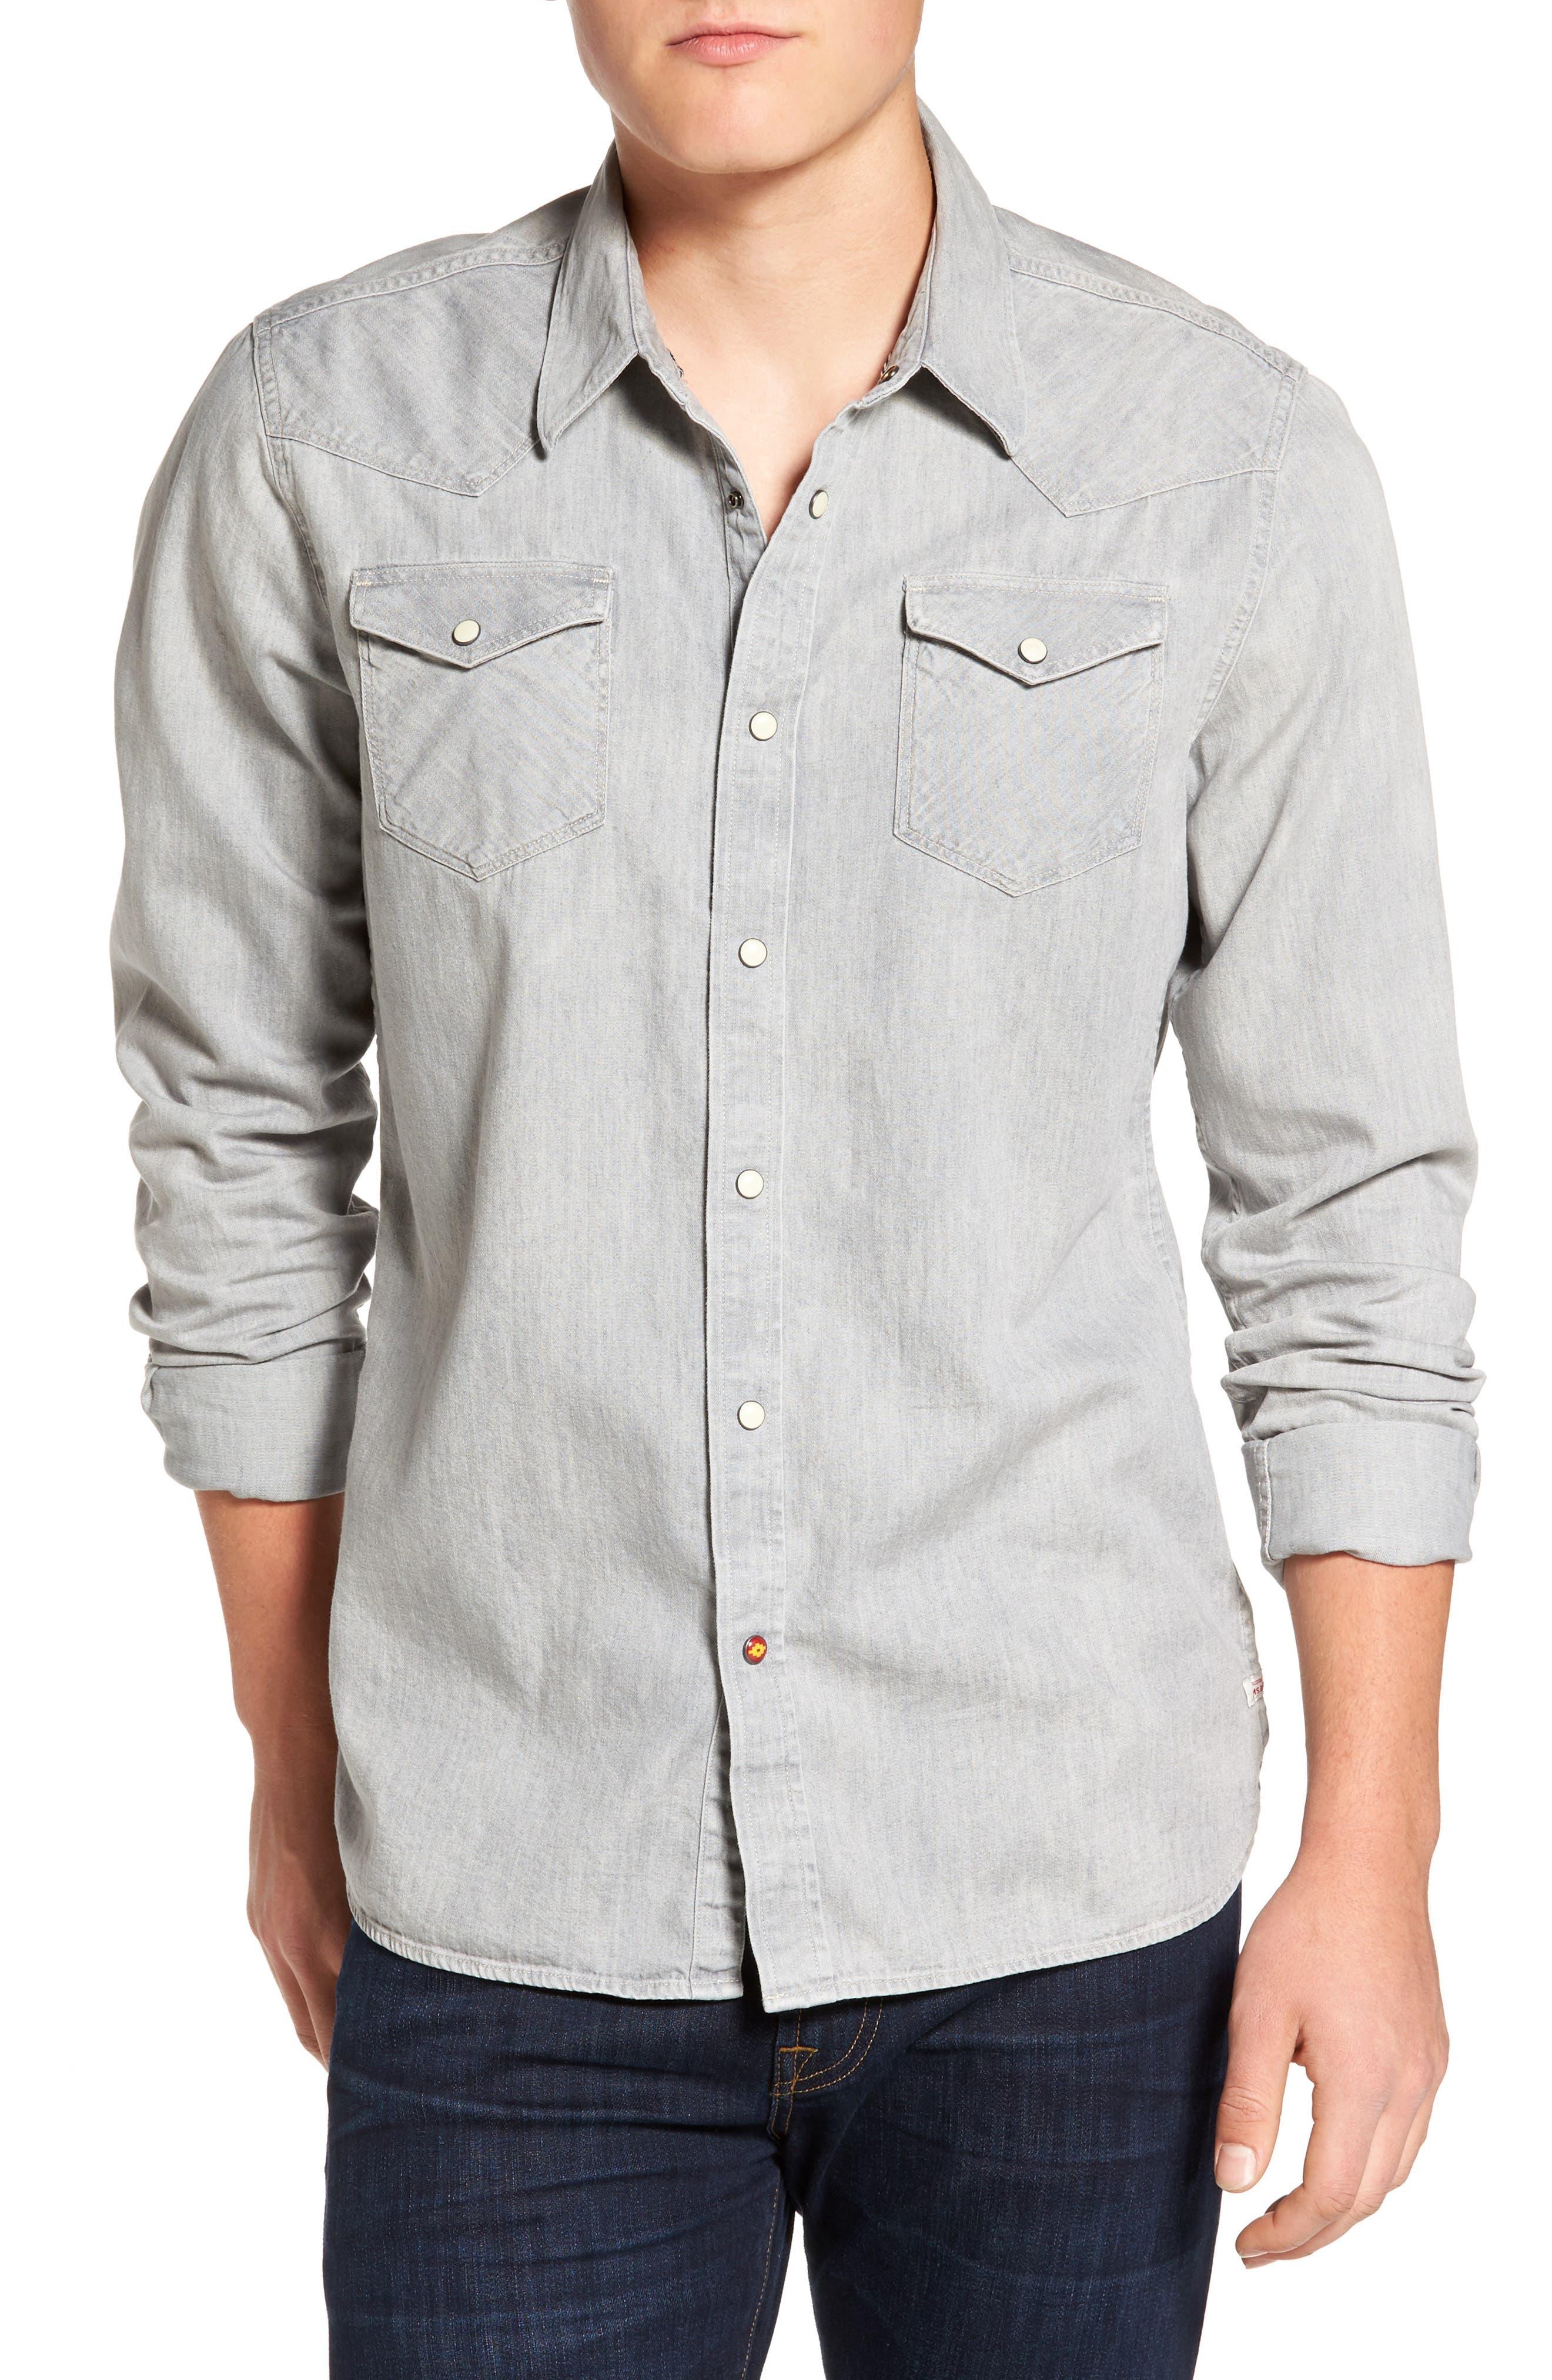 Main Image - Scotch & Soda Western Shirt